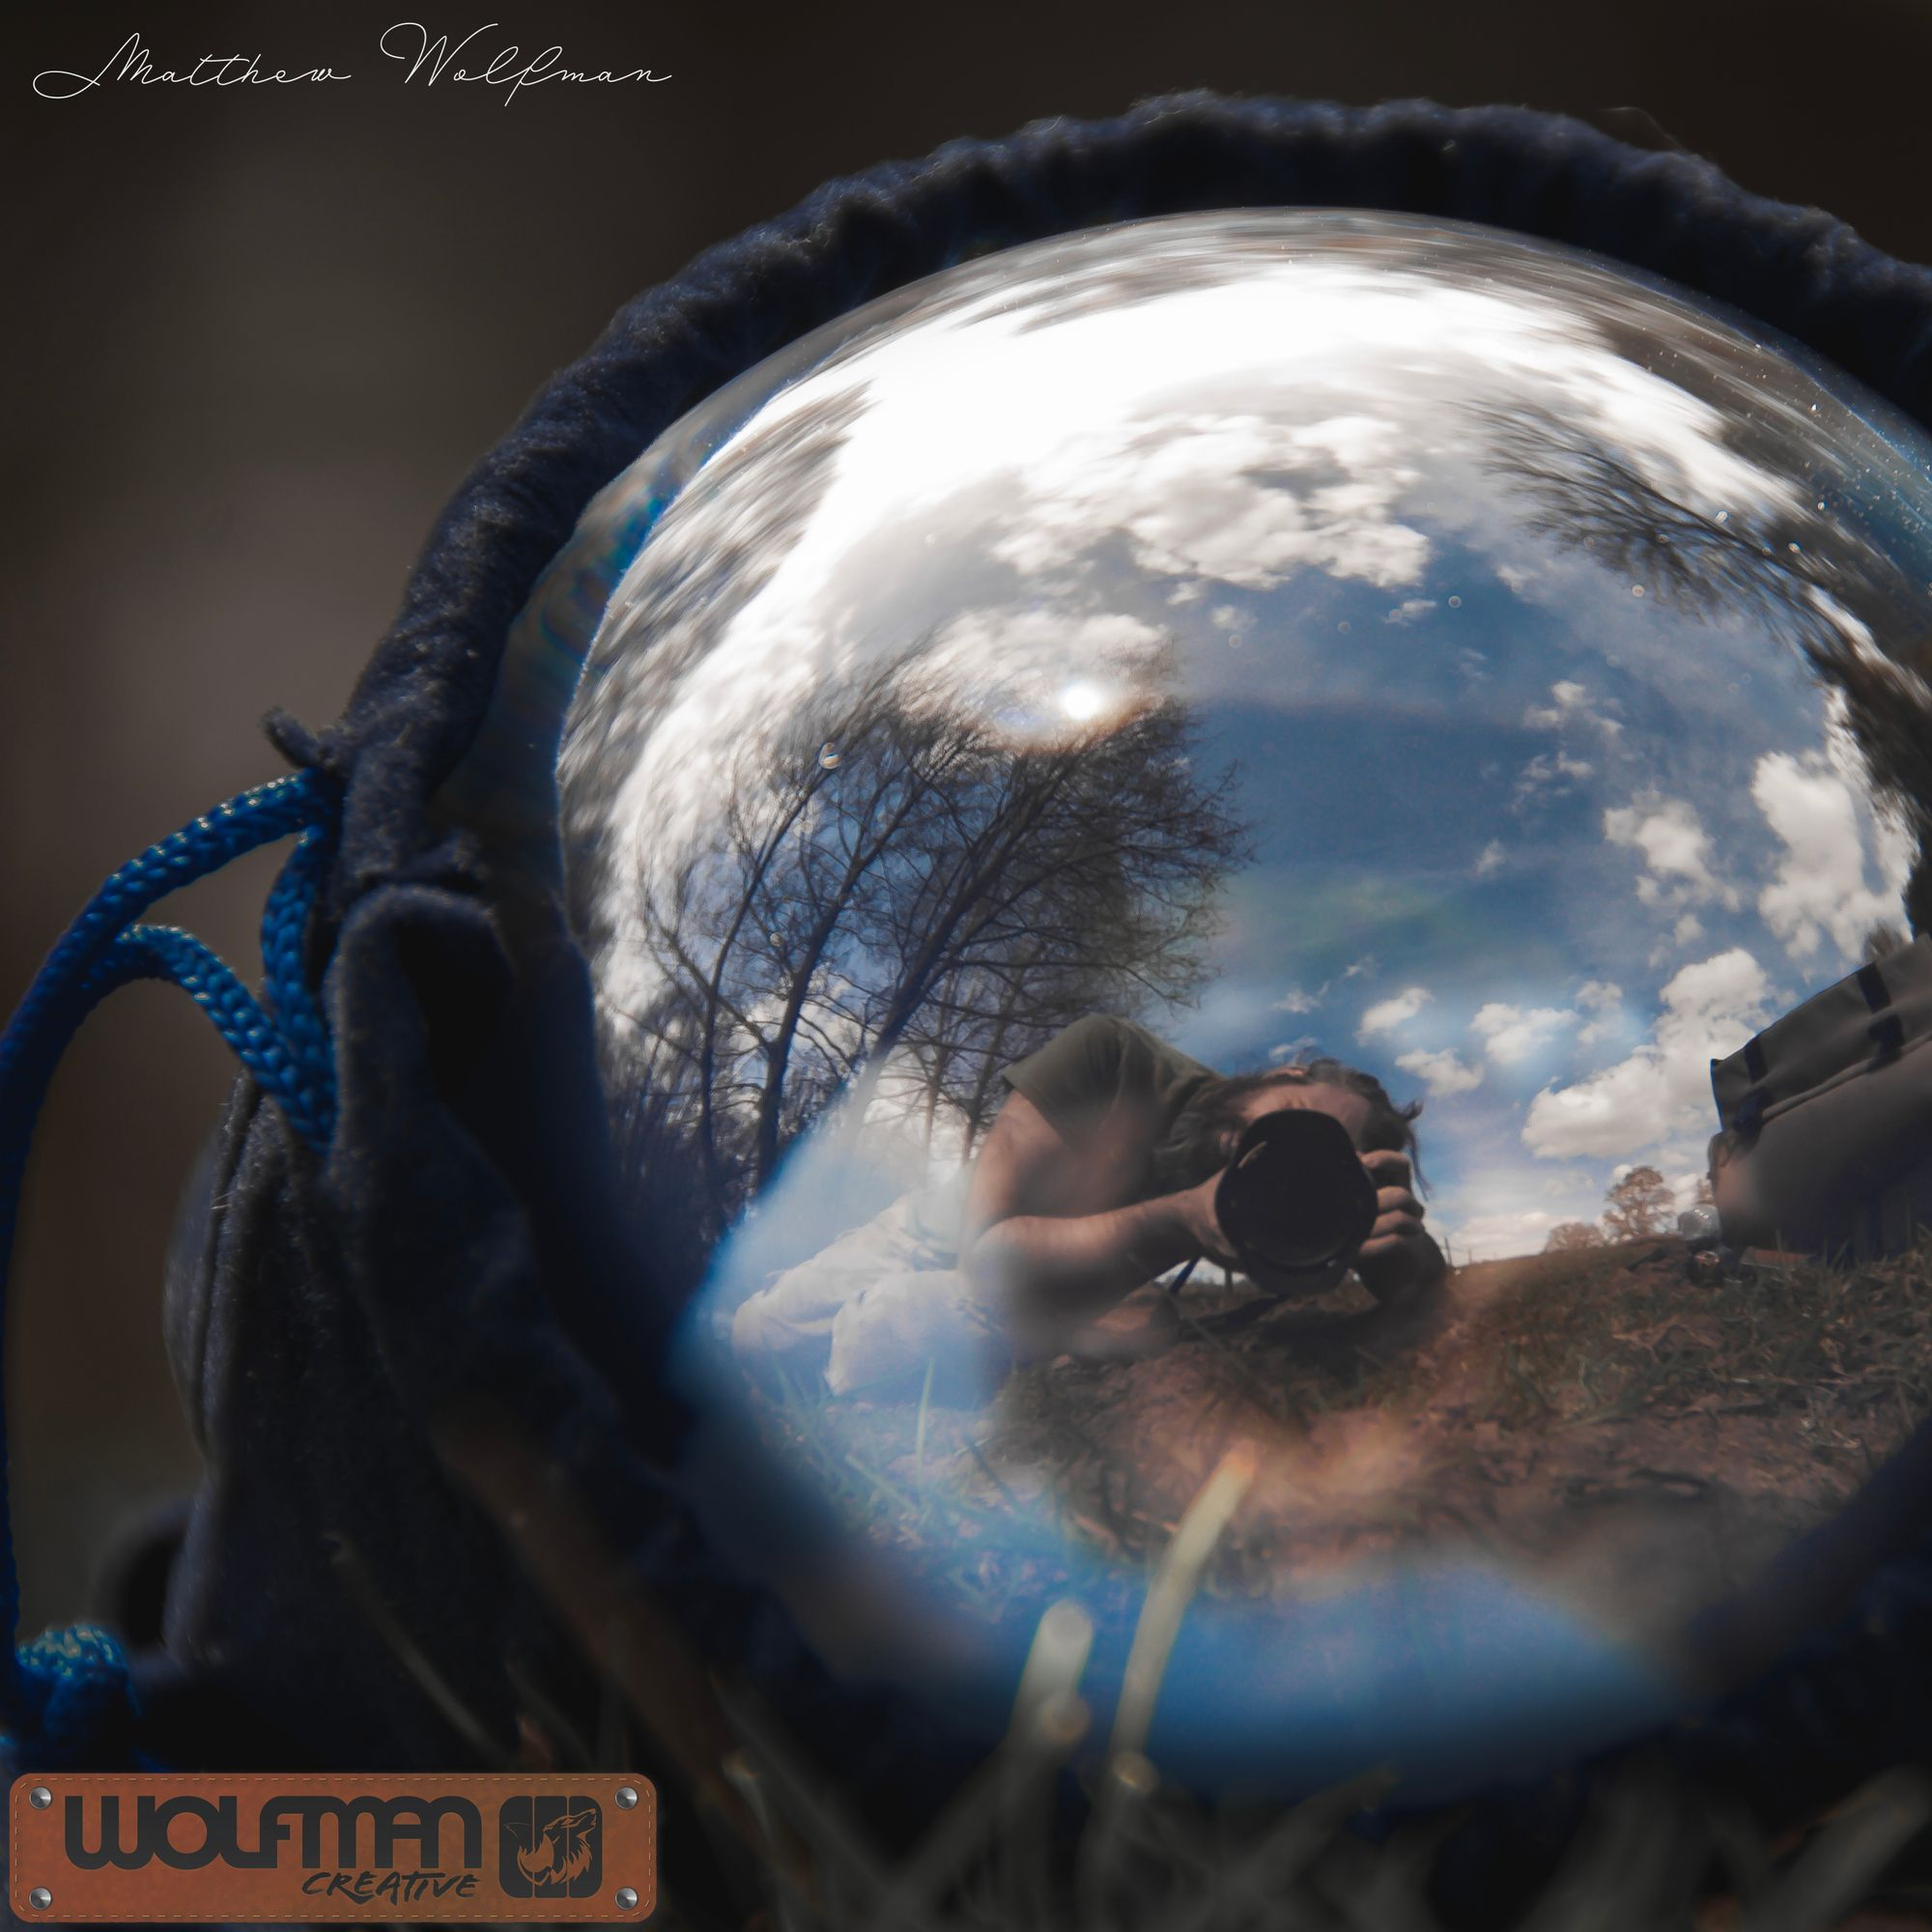 ▶️▶️ : Take a look at yourself Matthew... ▪️ #crystalsphere #witchthings #clearquartz #crystalpendant #crystalenergy #glaskugelfotografie #lensball #lensballphotography #glaskugel #lensballshots #lensballphoto #glassball #crystalball #glassballphotography #lensballfamily #reflection #crystallball #crystalballphotography #lensballfotografie #photographyislife #photographysouls #photographyeveryday #photographylover #worldbestgram #iglobal_photographers #ig_great_pics #ig_myshot